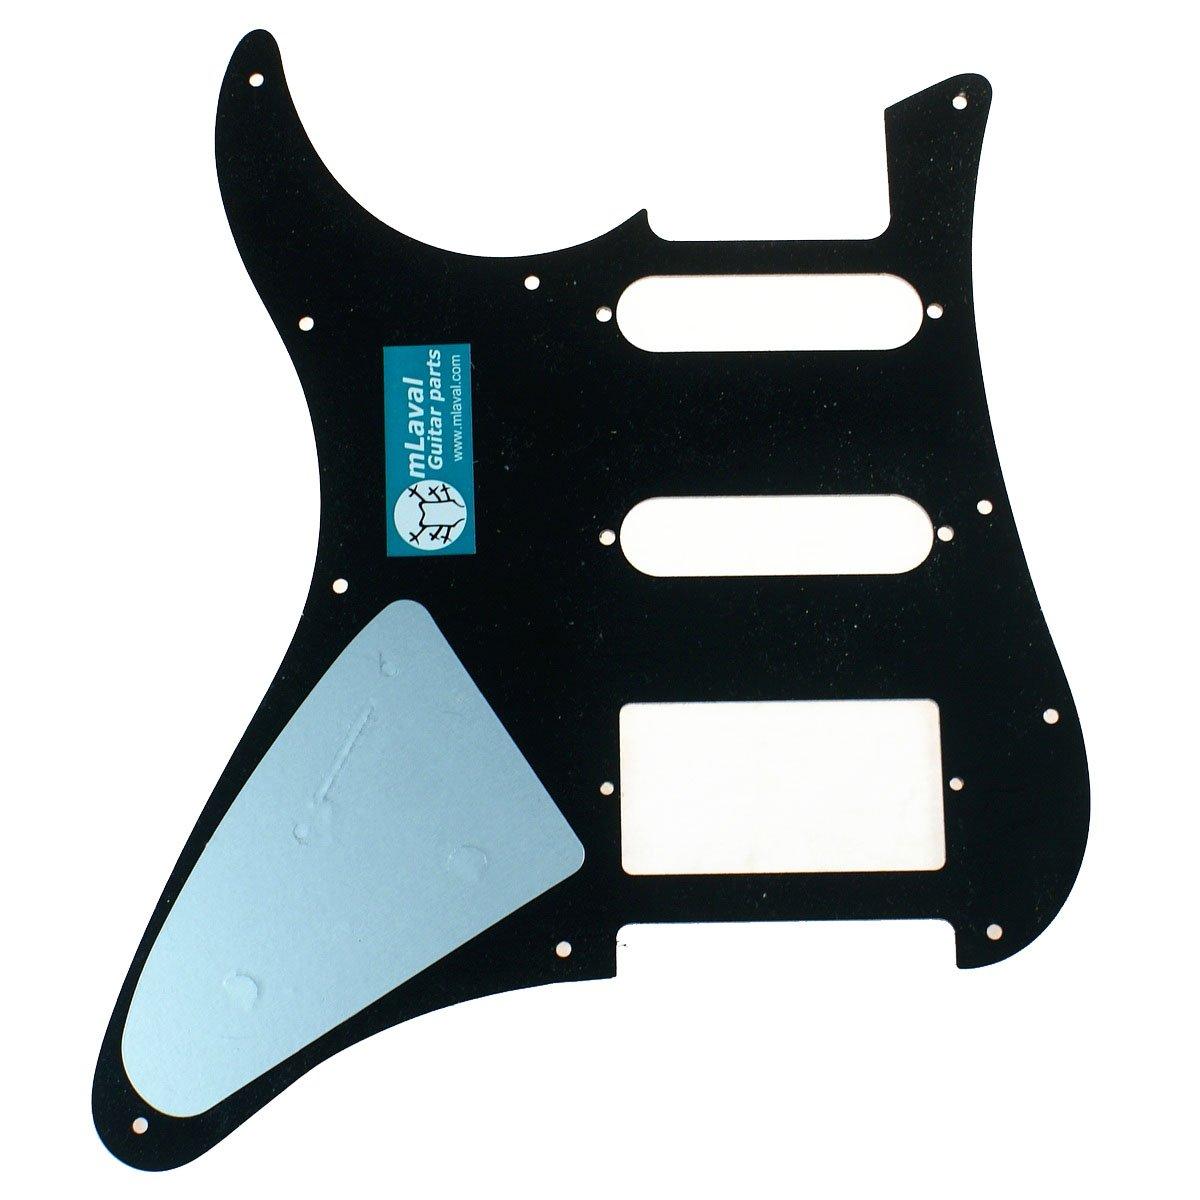 3 capas golpeador de guitarra para Yamaha Pacifica EG 112 eg112 - Negro (B71): Amazon.es: Instrumentos musicales